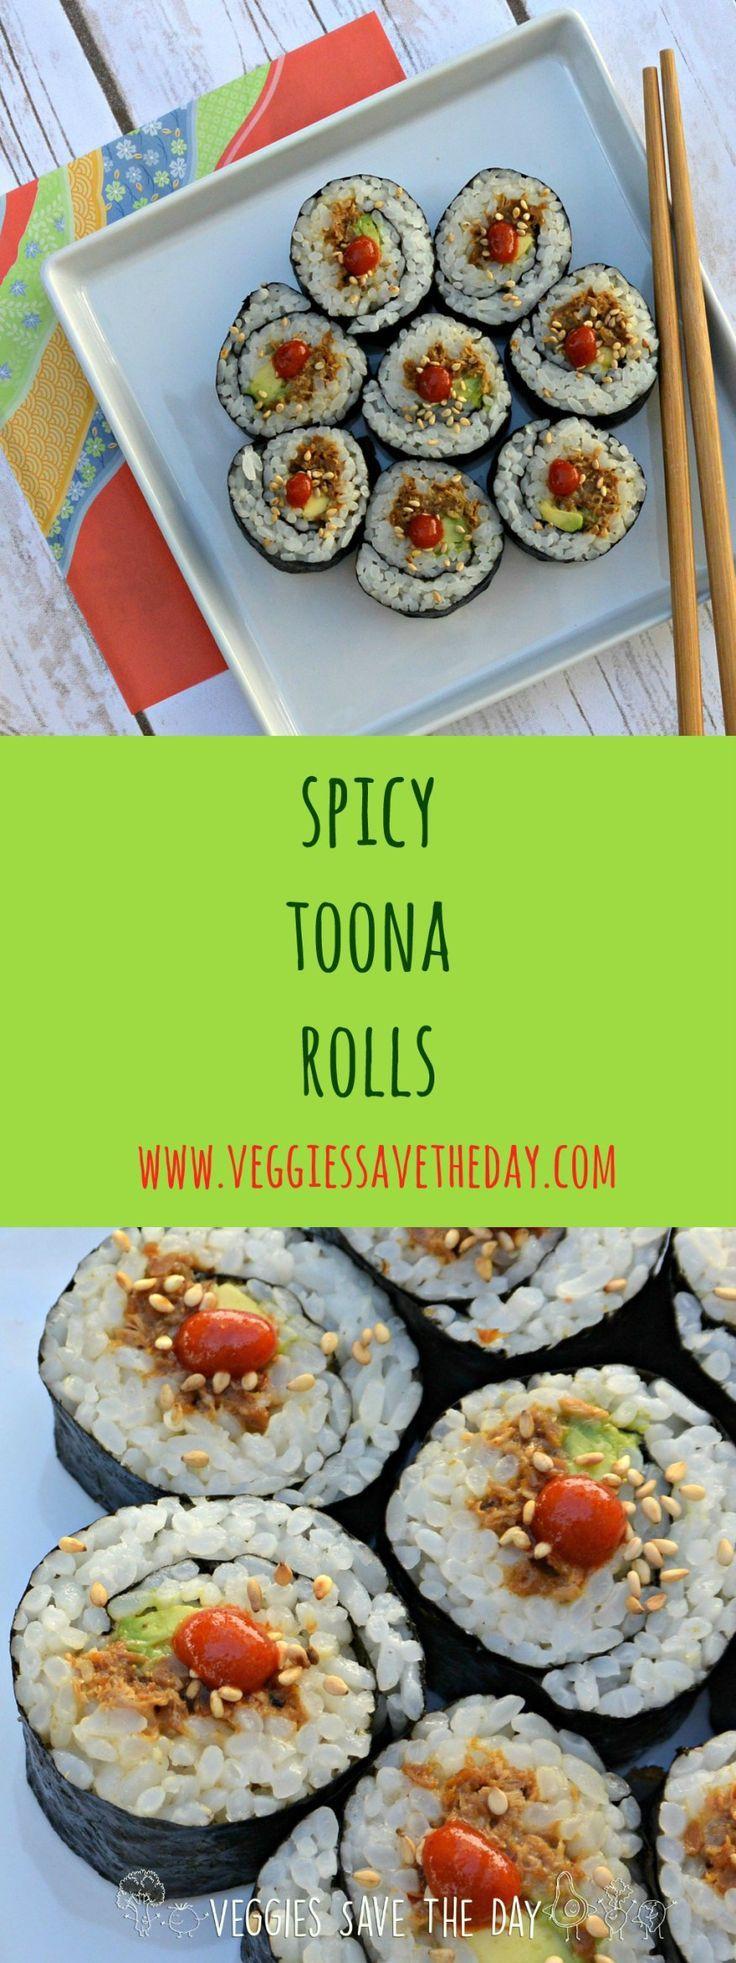 Sophie S Kitchen Vegan Toona Recipe